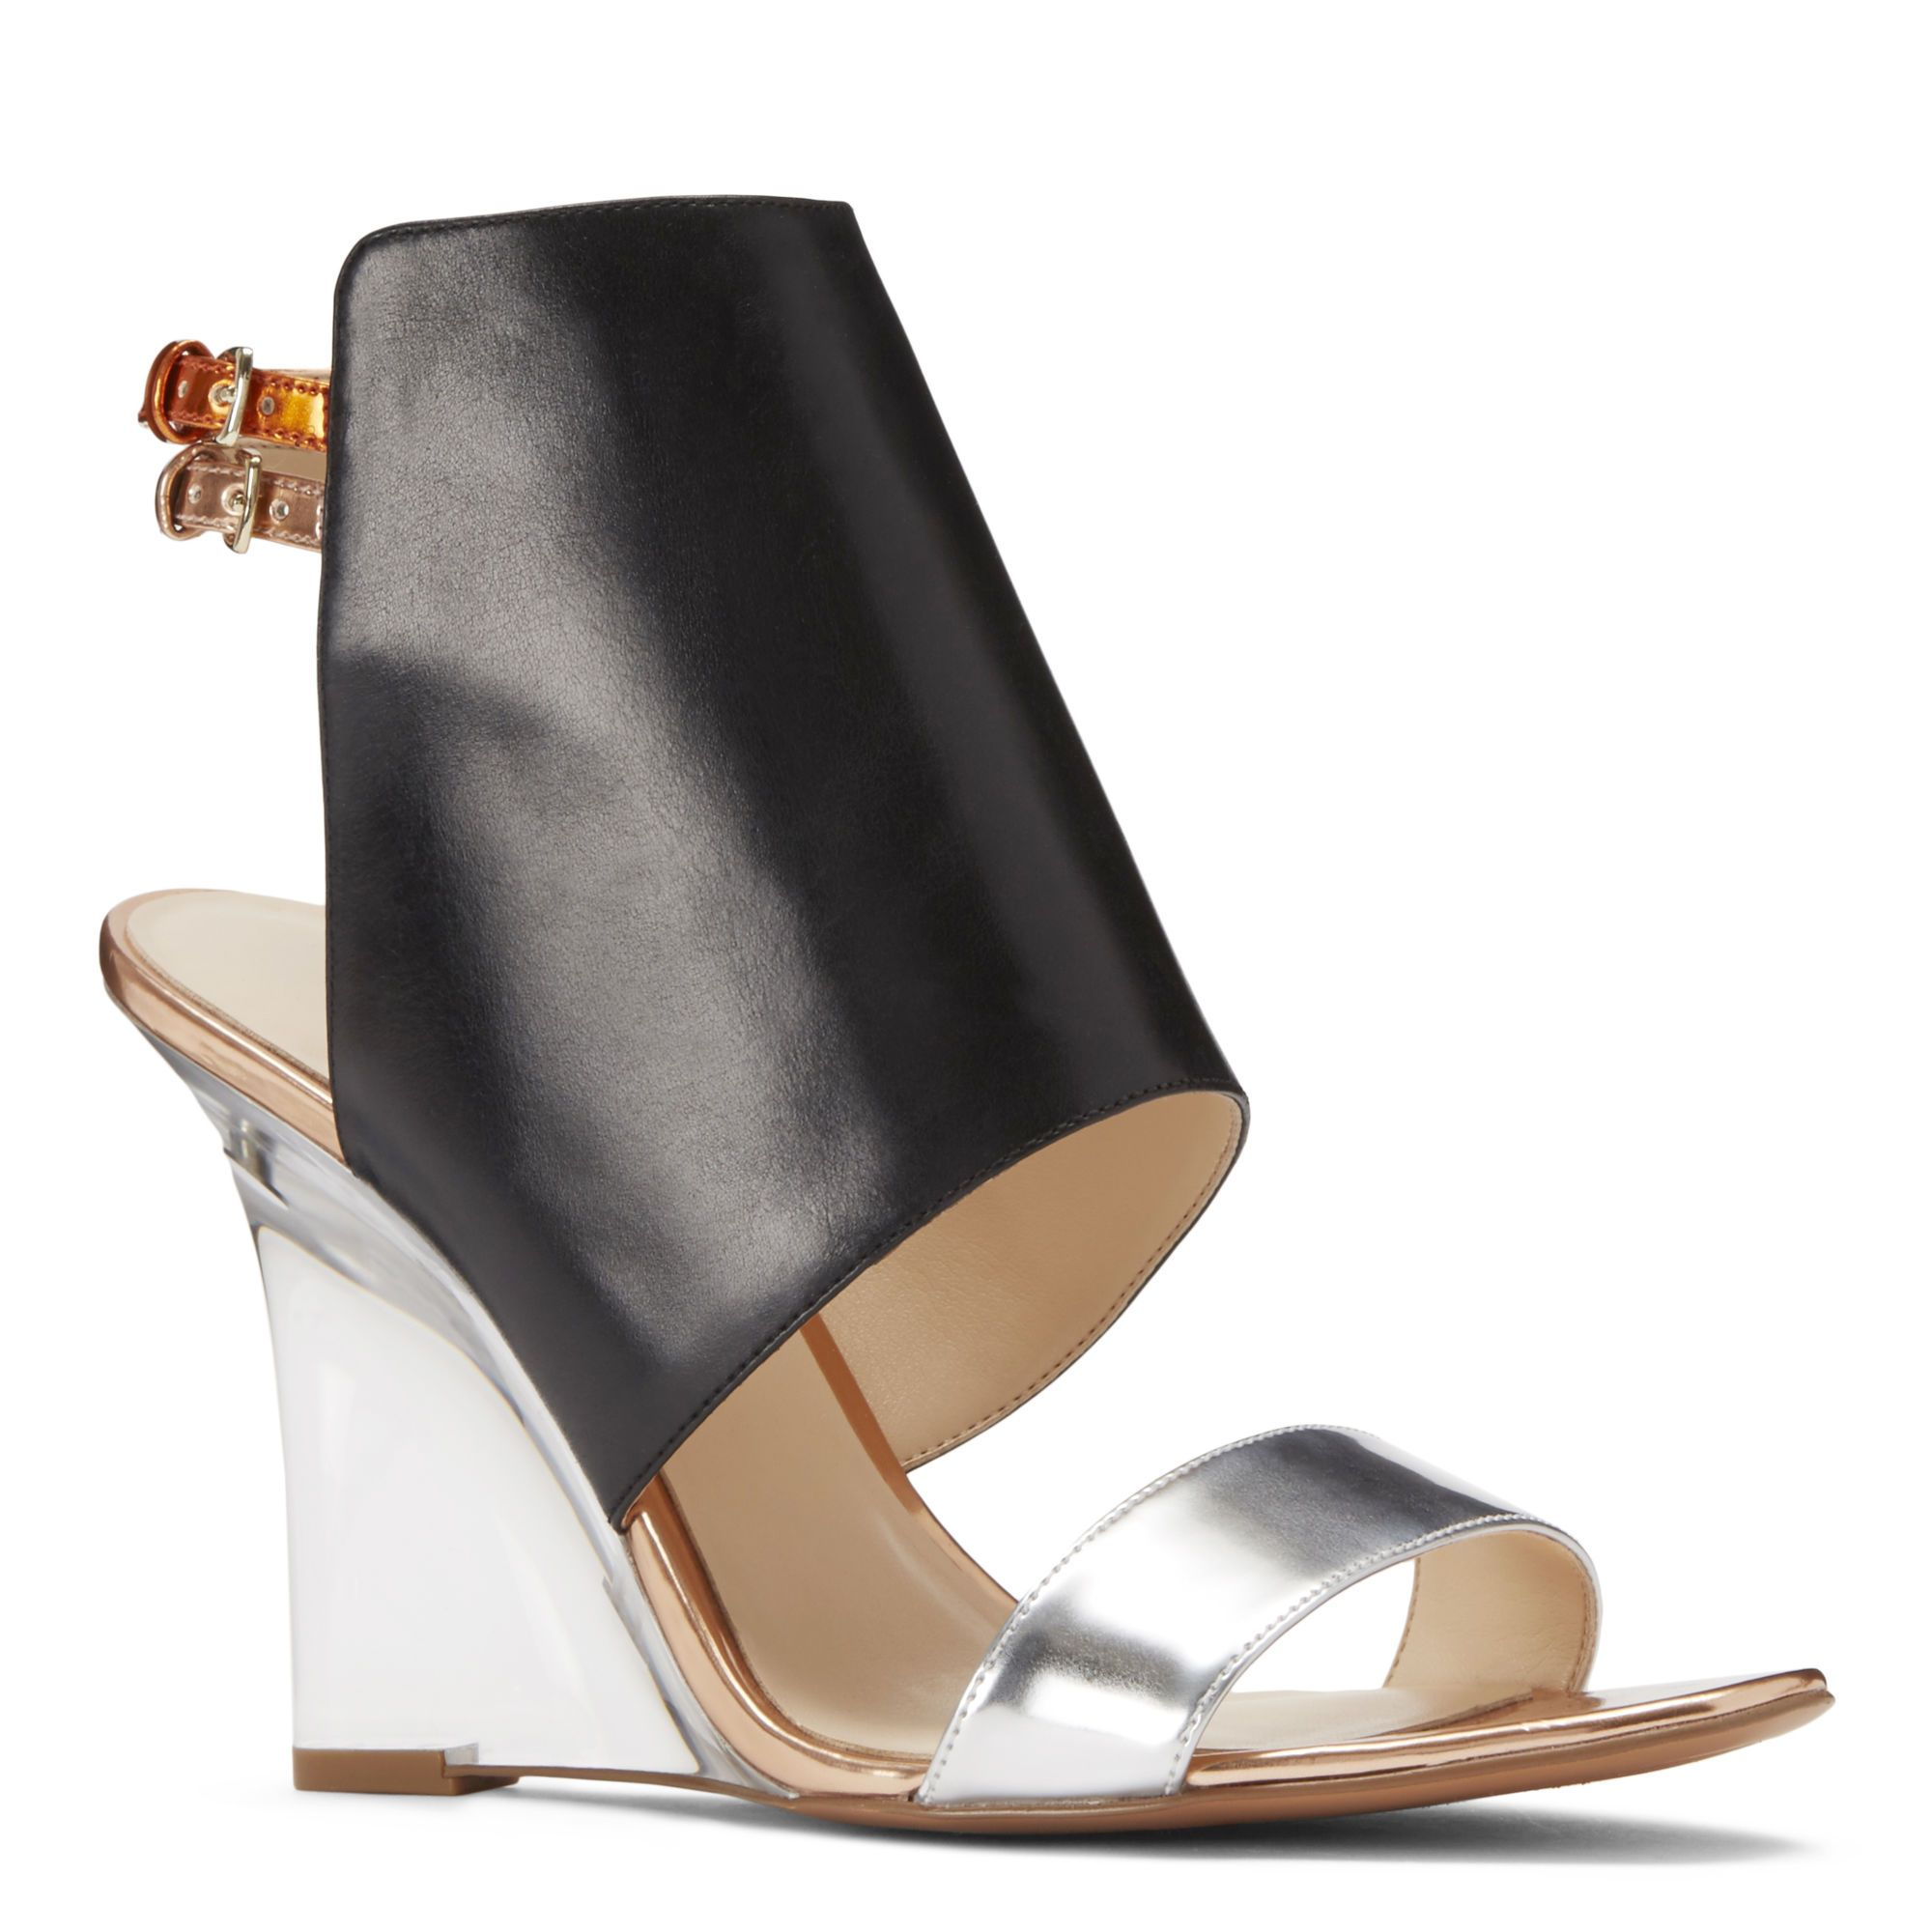 Black sandals nine west - Black And Silver Bueta Ankle Strap Wedge Sandals Nine West